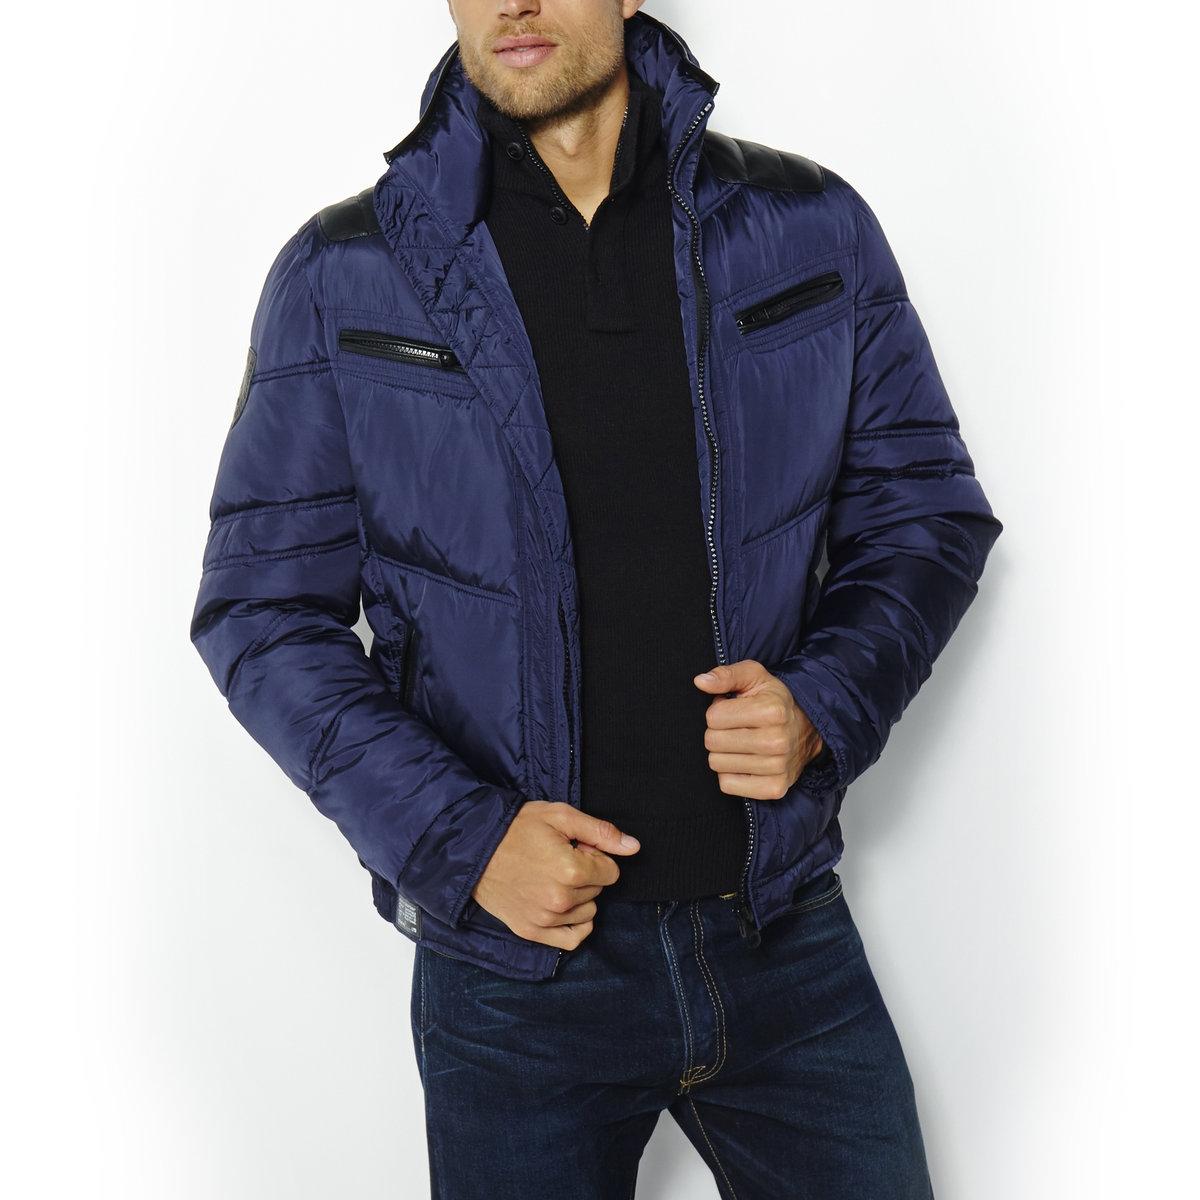 Куртка стеганая средней длины AIDEN NEPALСтеганая куртка AIDEN NEPAL от  REDSKINS. Стеганая куртка на молнии. 100% нейлона®.  Вставки на плечах. 4 кармана на молнии. Капюшон в воротнике. 2 внутренних кармана на молнии. Длина куртки ок: 65 см.<br><br>Цвет: темно-синий